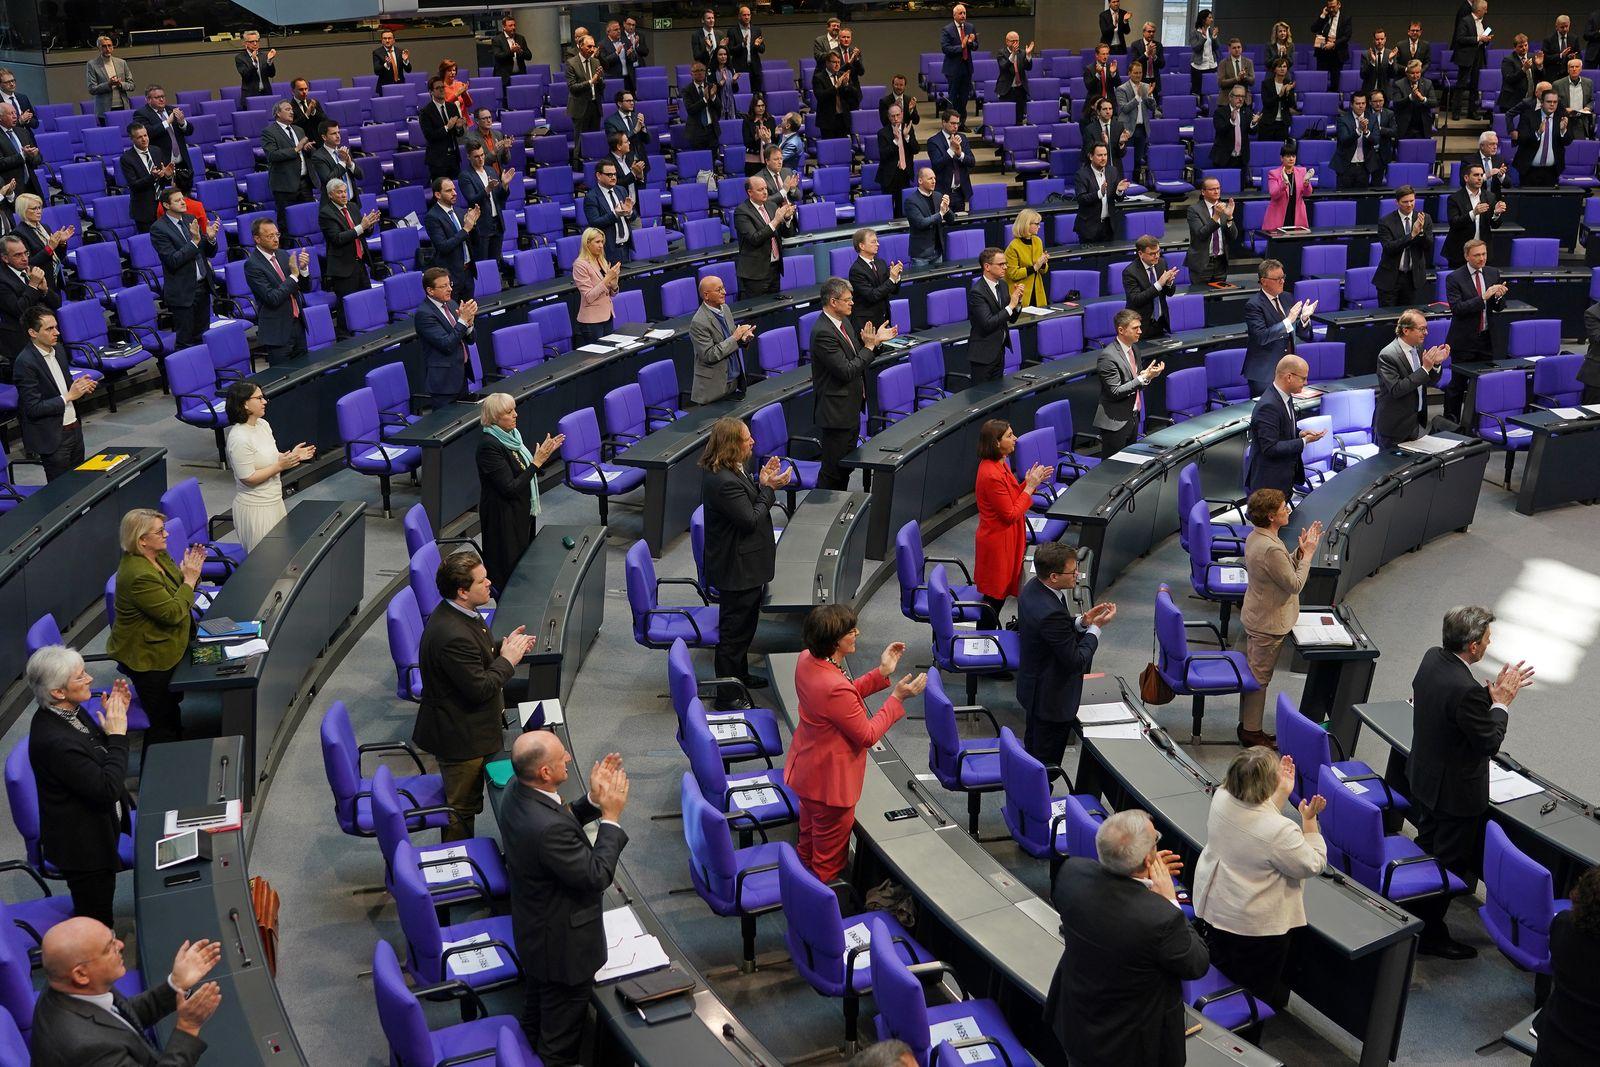 ***BESTPIX*** Bundestag Debates Legislation To Counter Coronavirus Effects